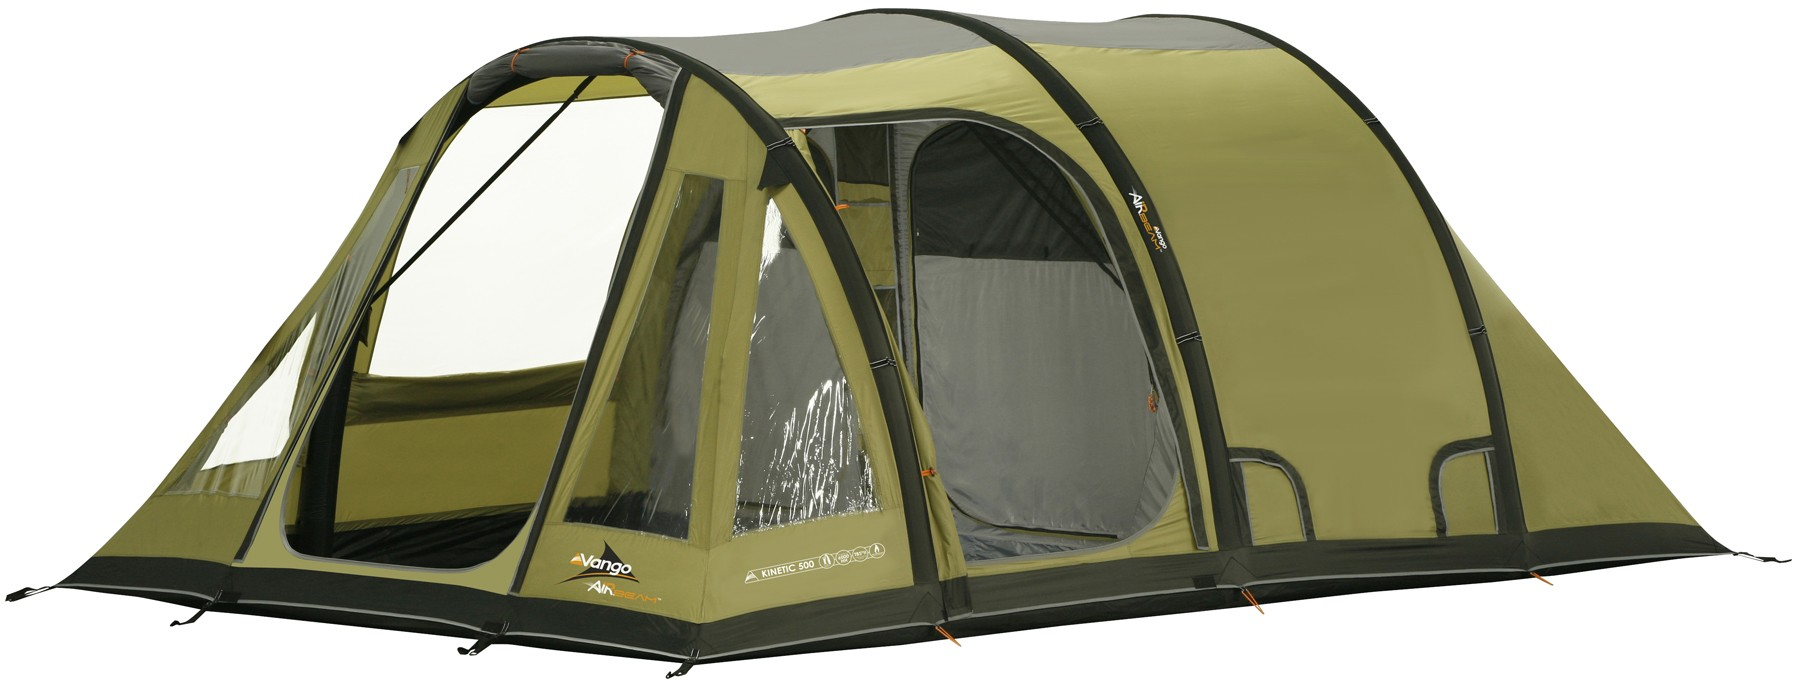 Vango Kinetic 500 Airbeam Tunnel Tent by Vango for £600.00